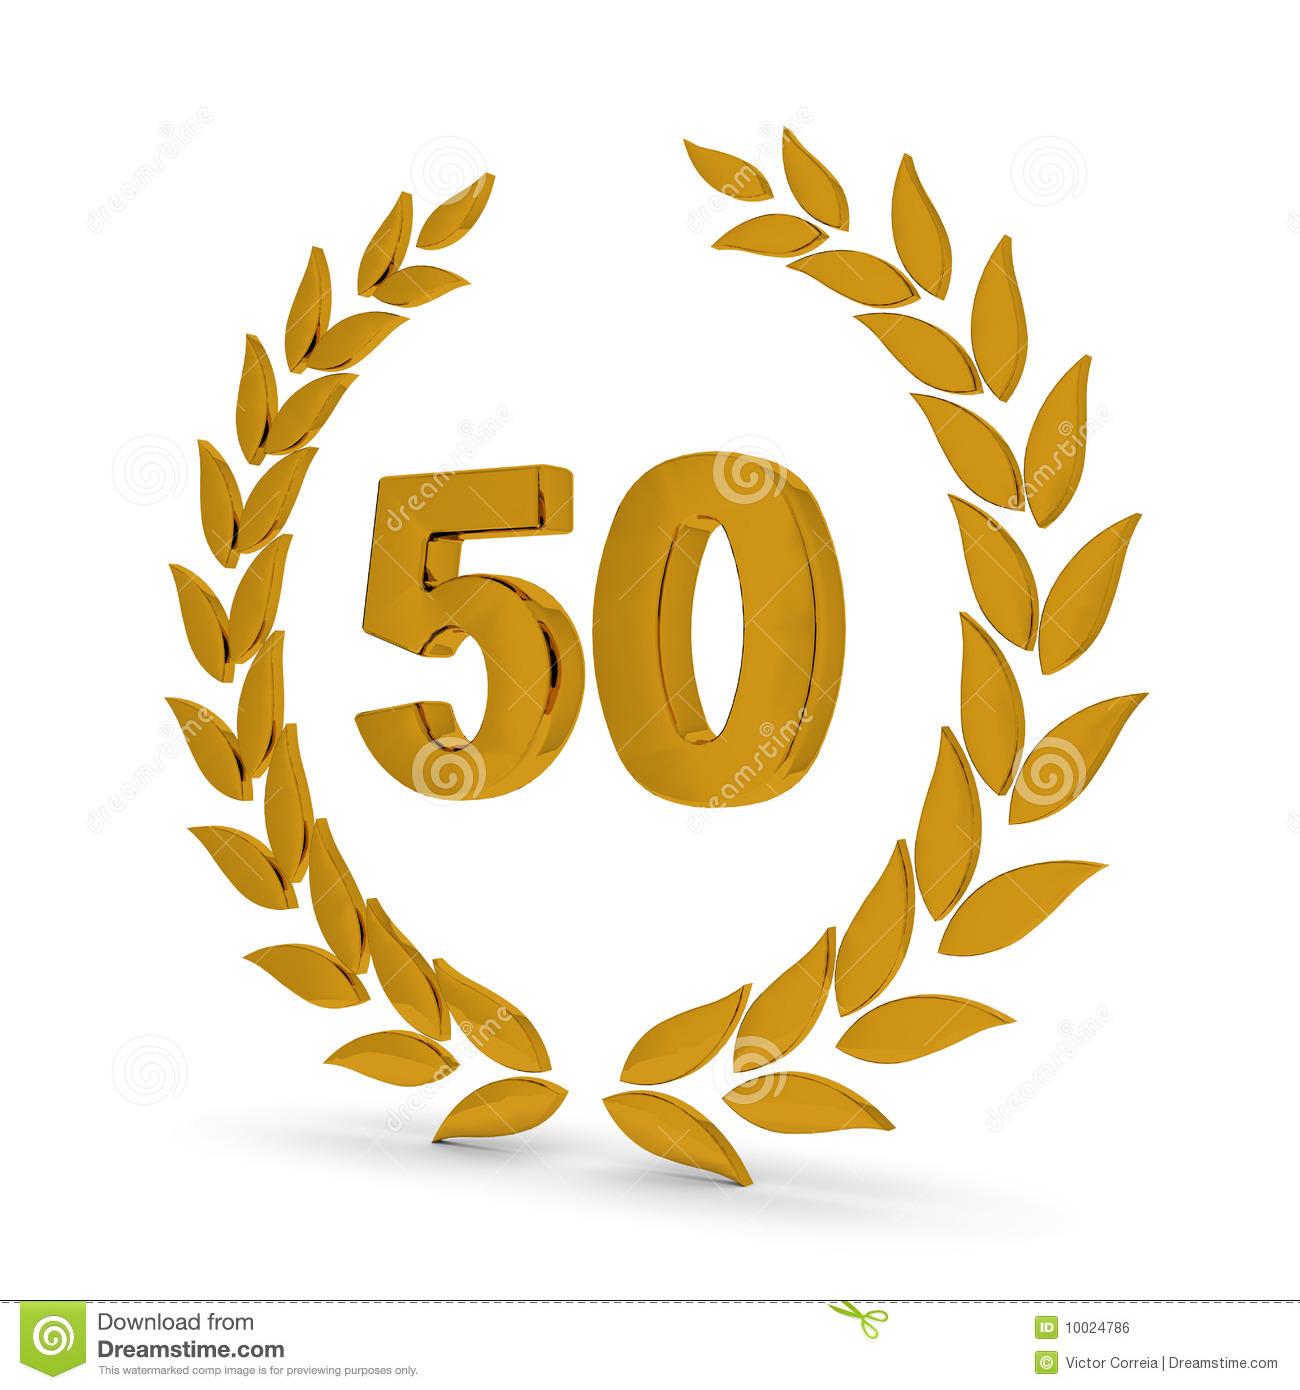 50th Wedding Anniversary Clip Art: 50th Business Anniversary Clipart